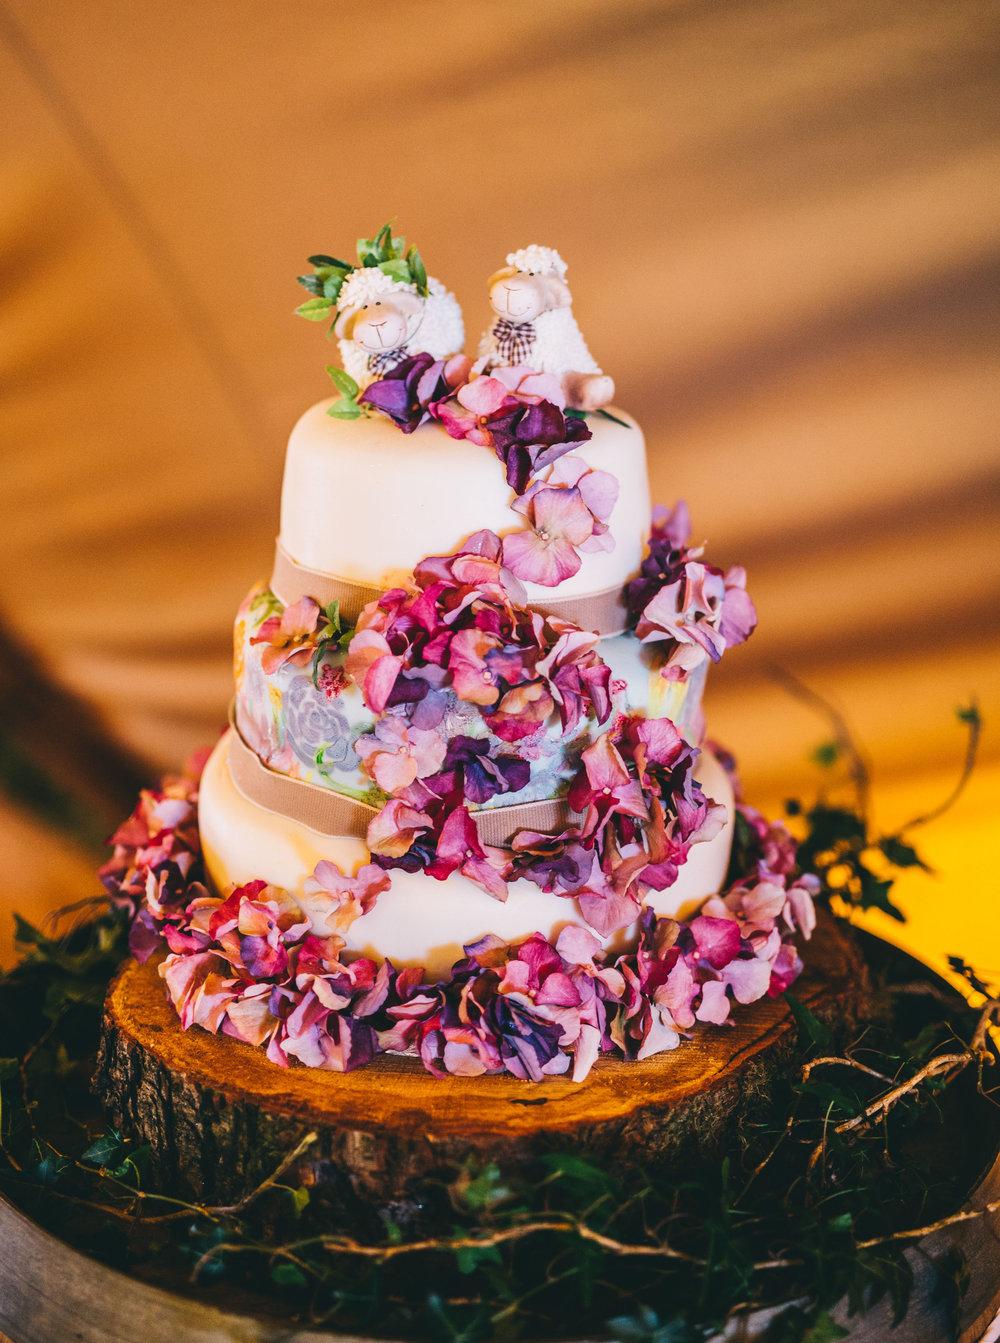 handmade wedding cake. north west wedding photography